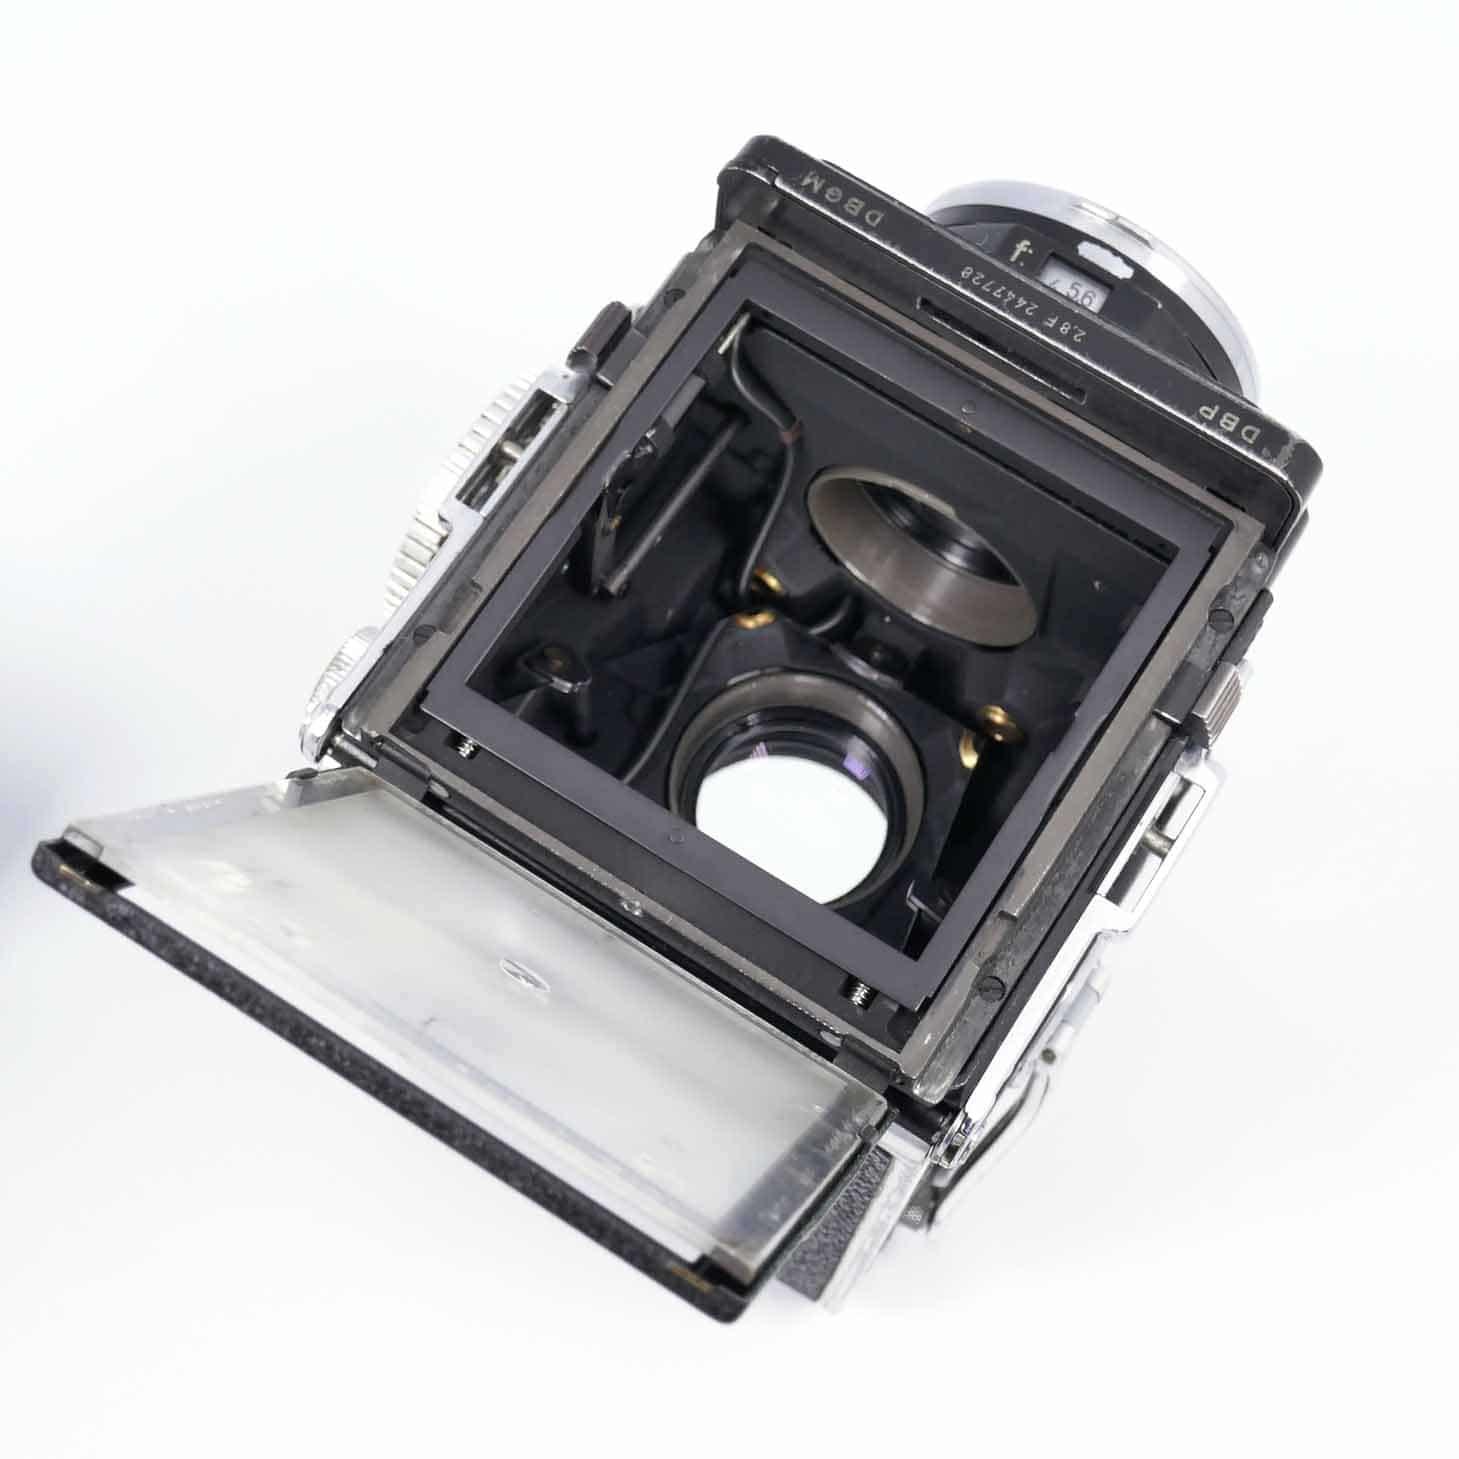 clean-cameras-Rolleiflex-2.8-F06